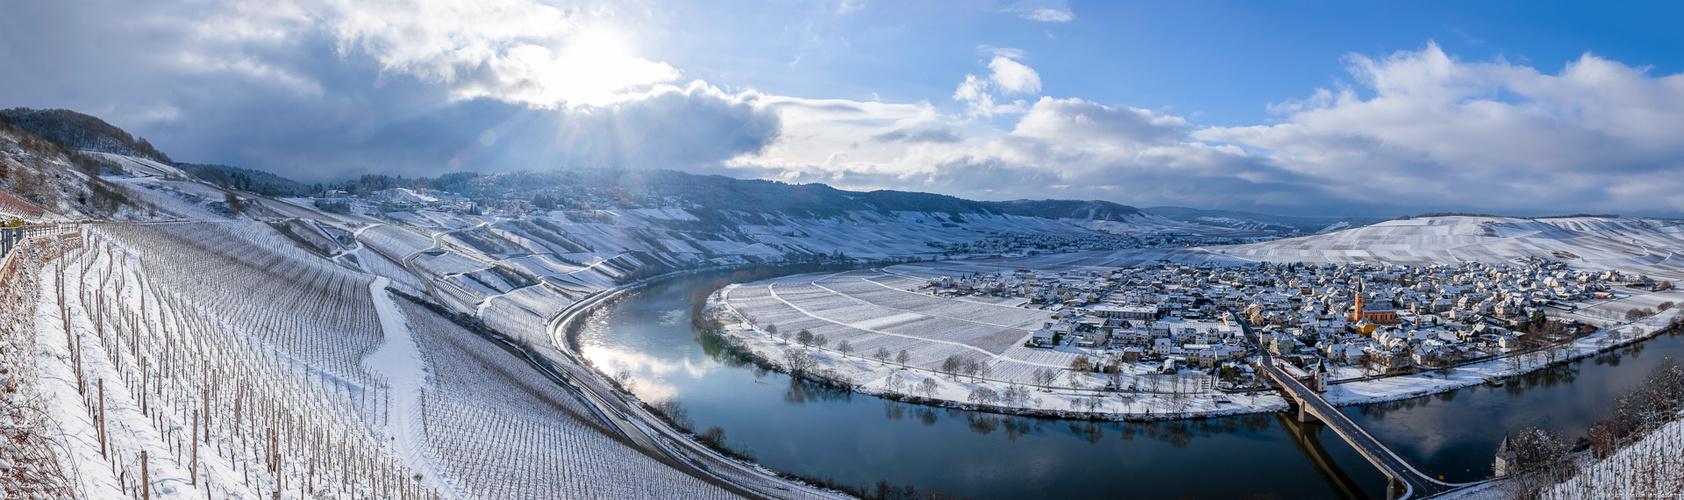 Trittenheimer Apotheke im Winter